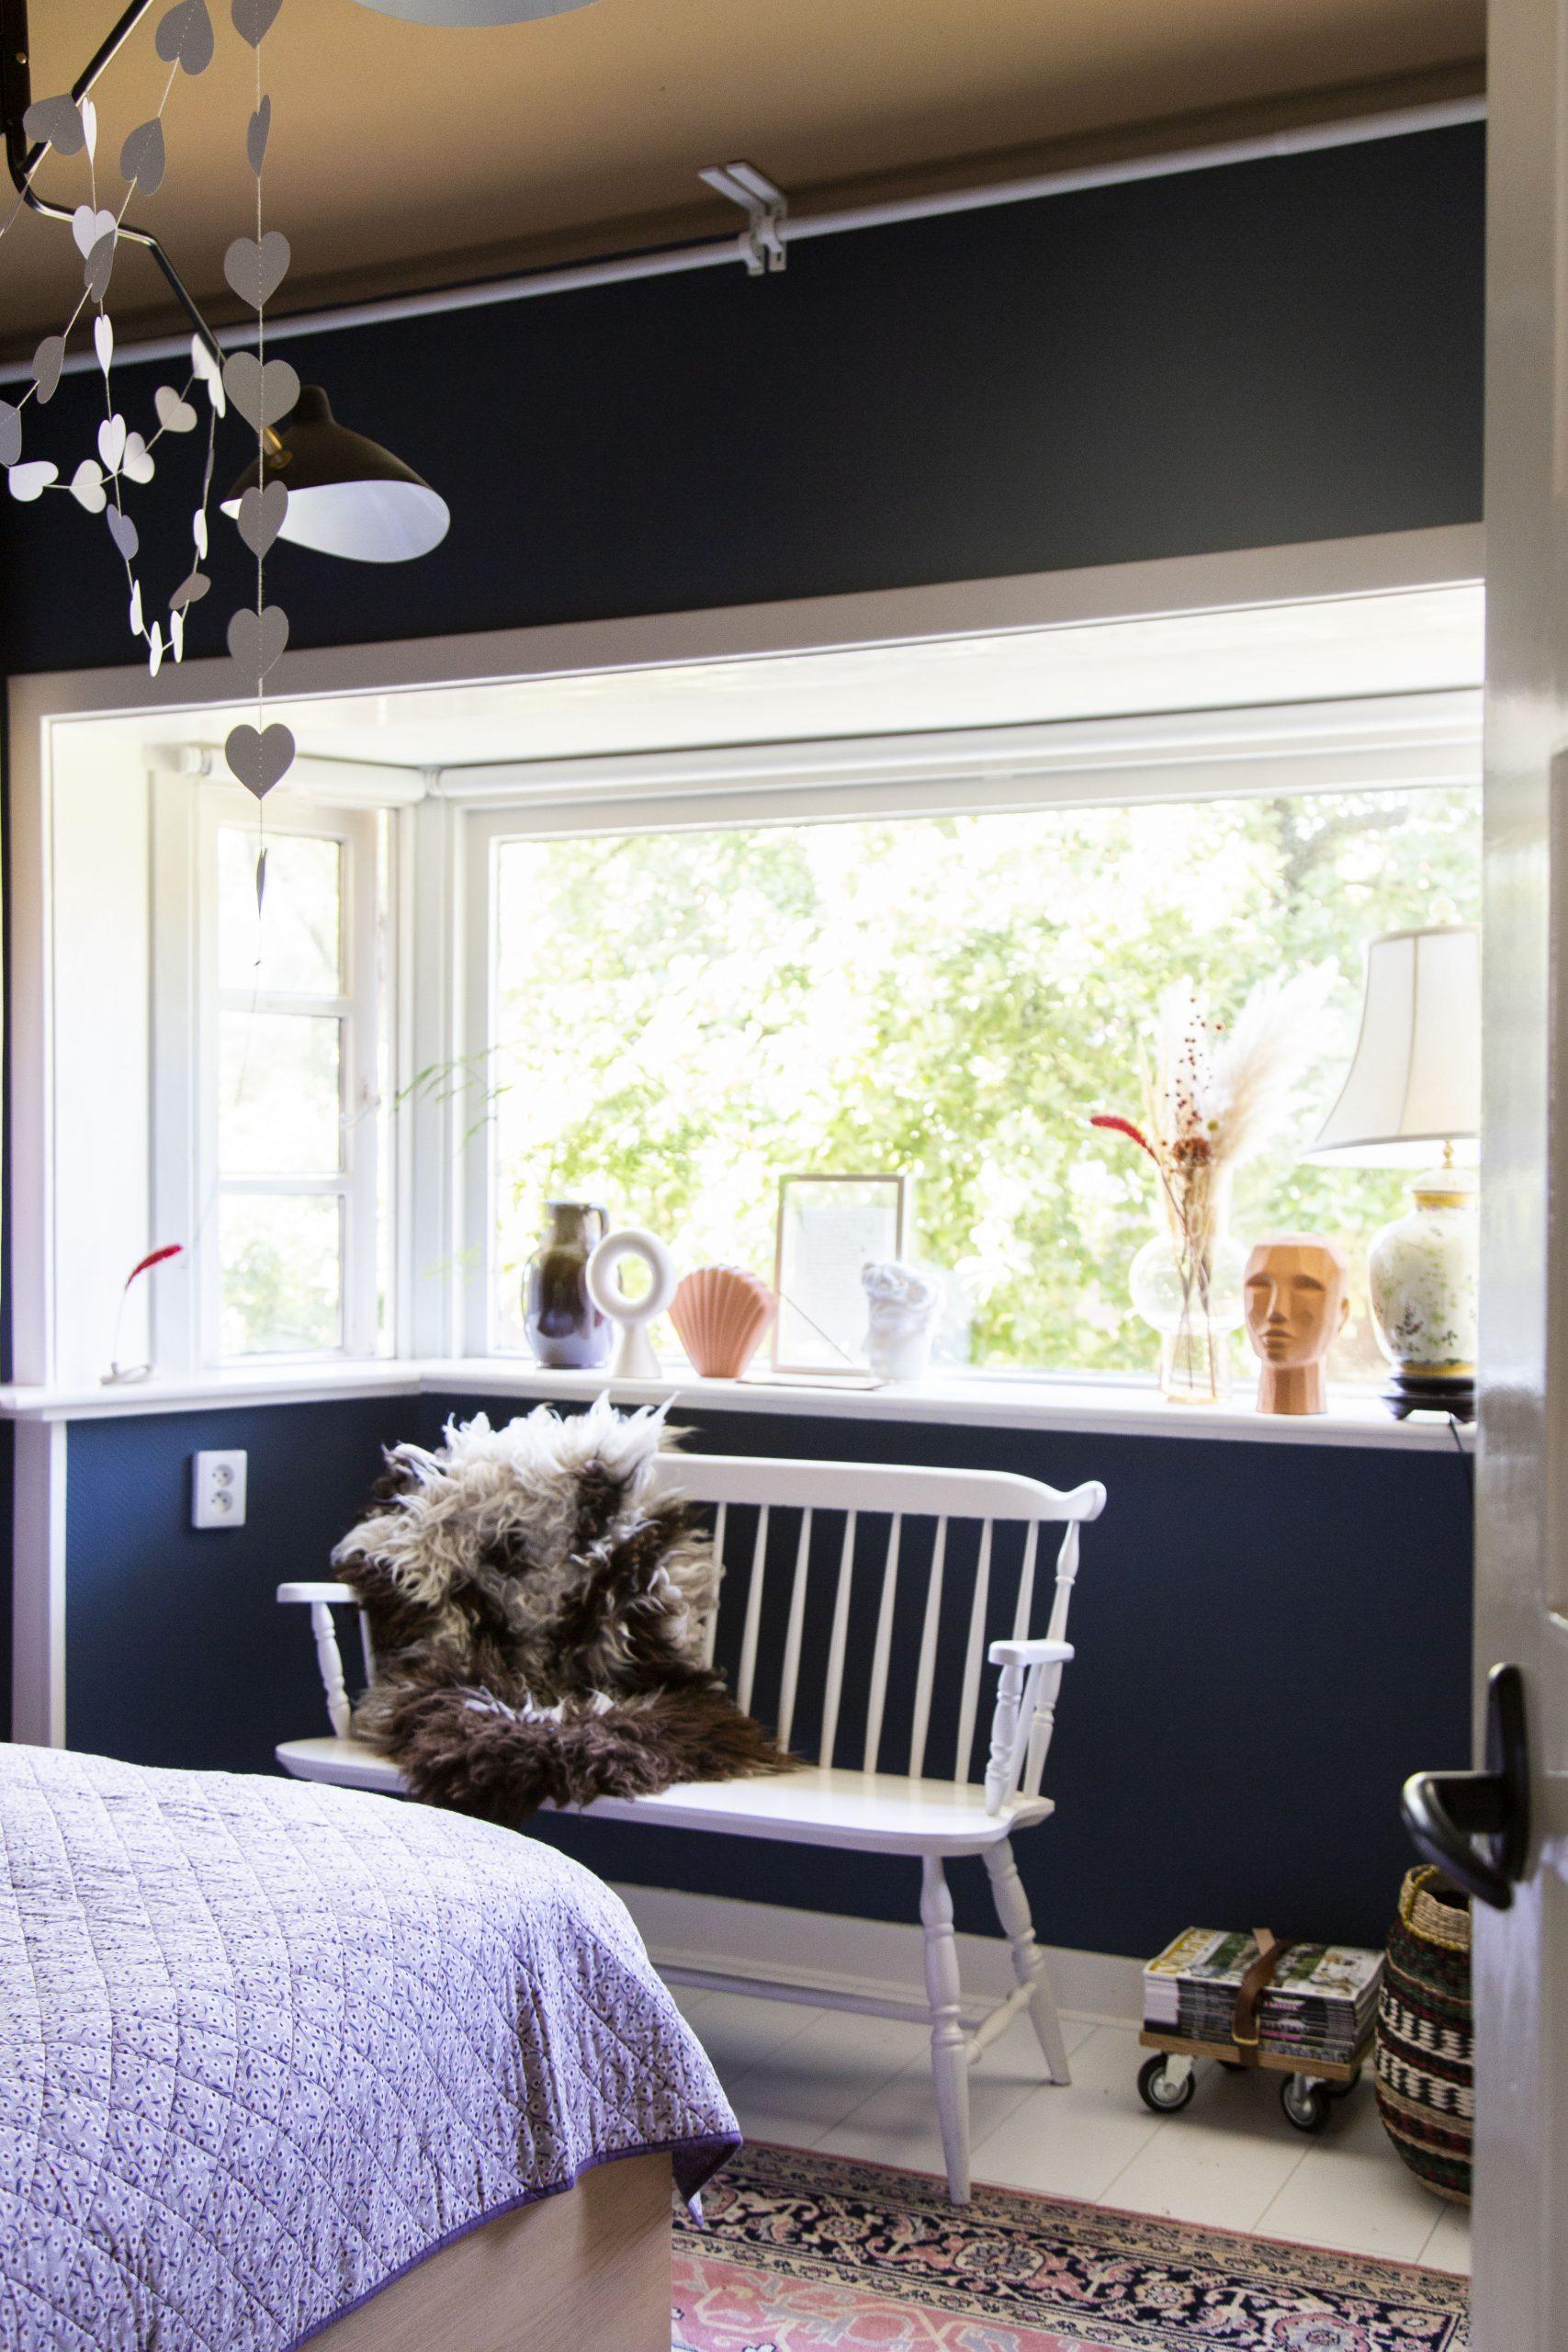 Window sill styling